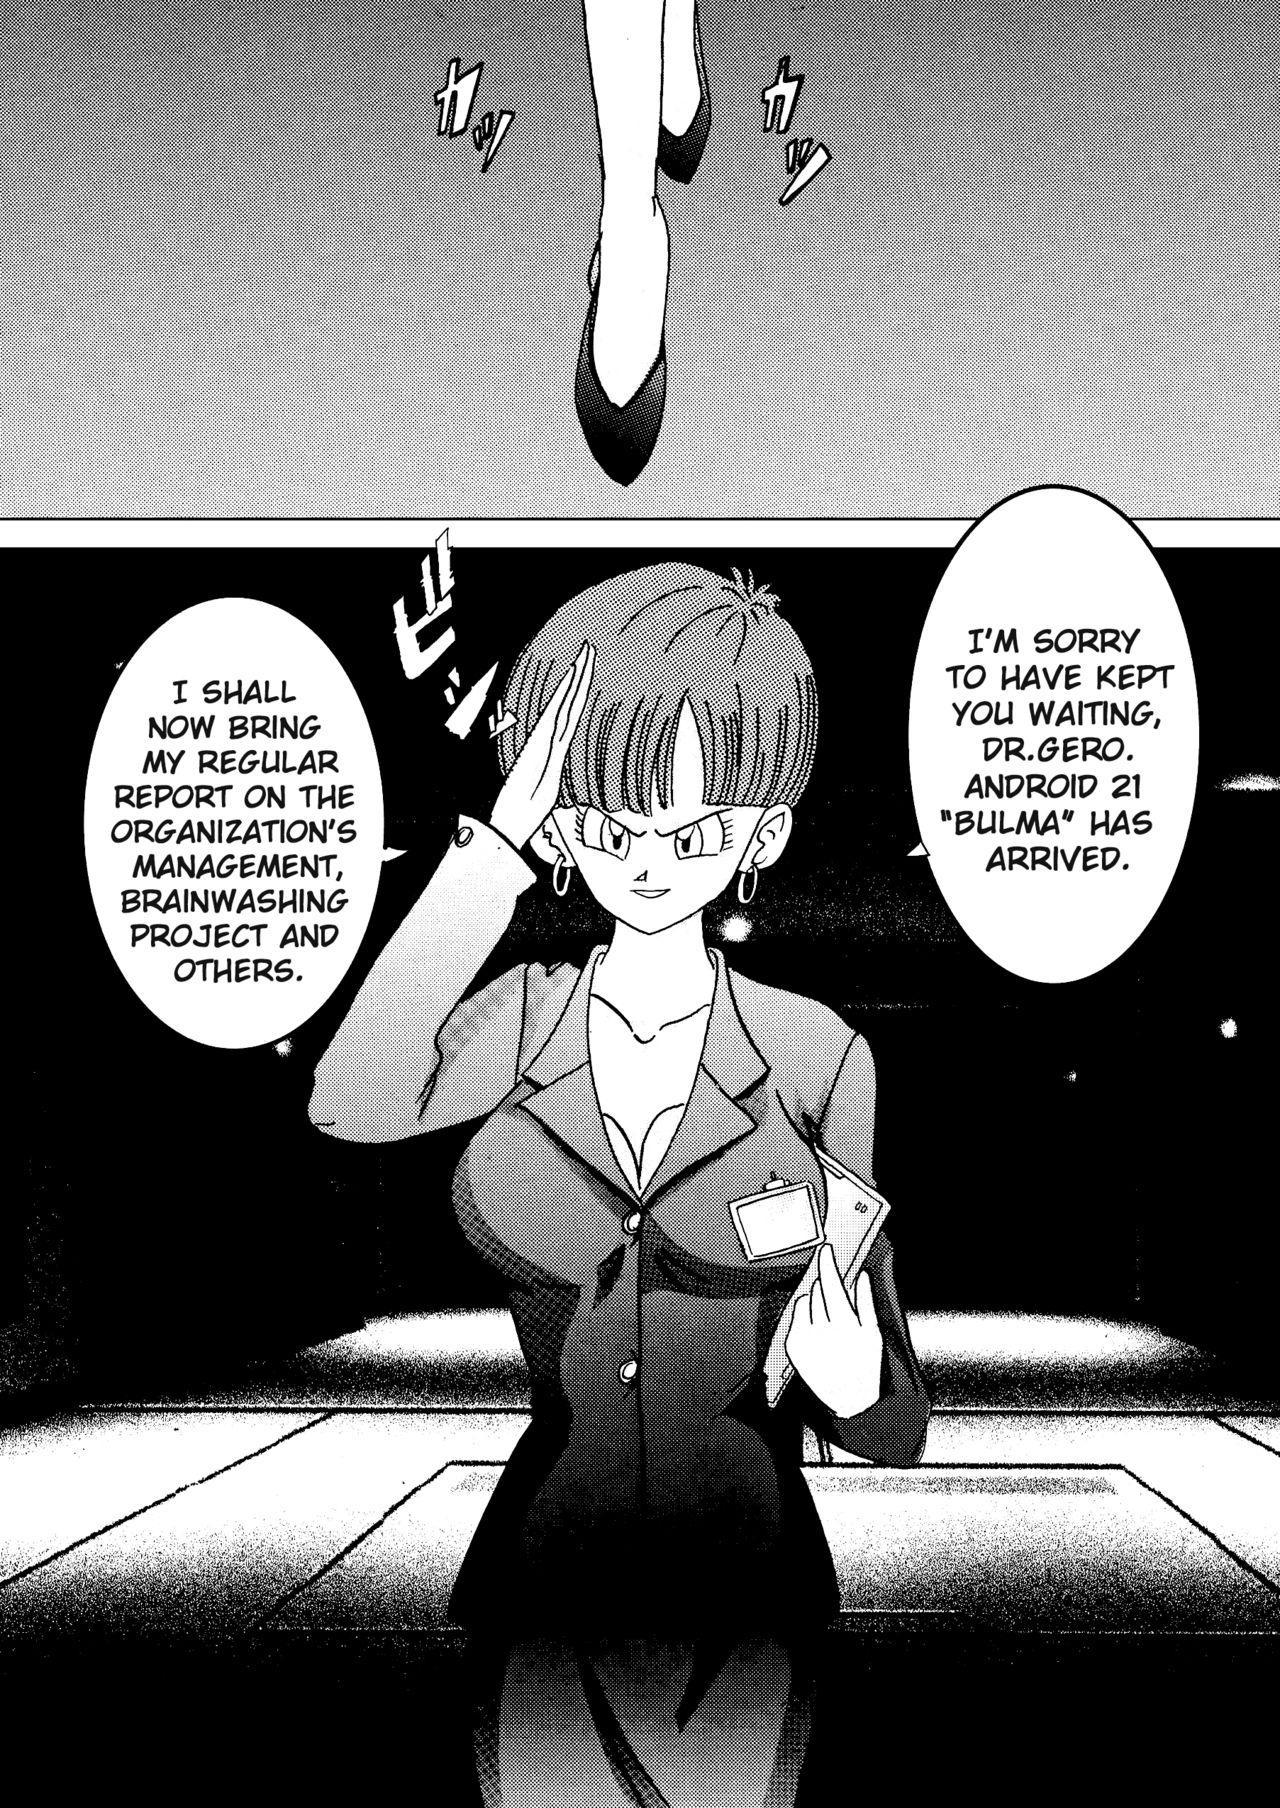 [Light Rate Port Pink] Tanjou!! Aku no Onna Senshi Jinzou Ningen 18-gou Sennou Kaizou Keikaku -Joshou- (Dragon Ball Z) [English] [ChoriScans] 2